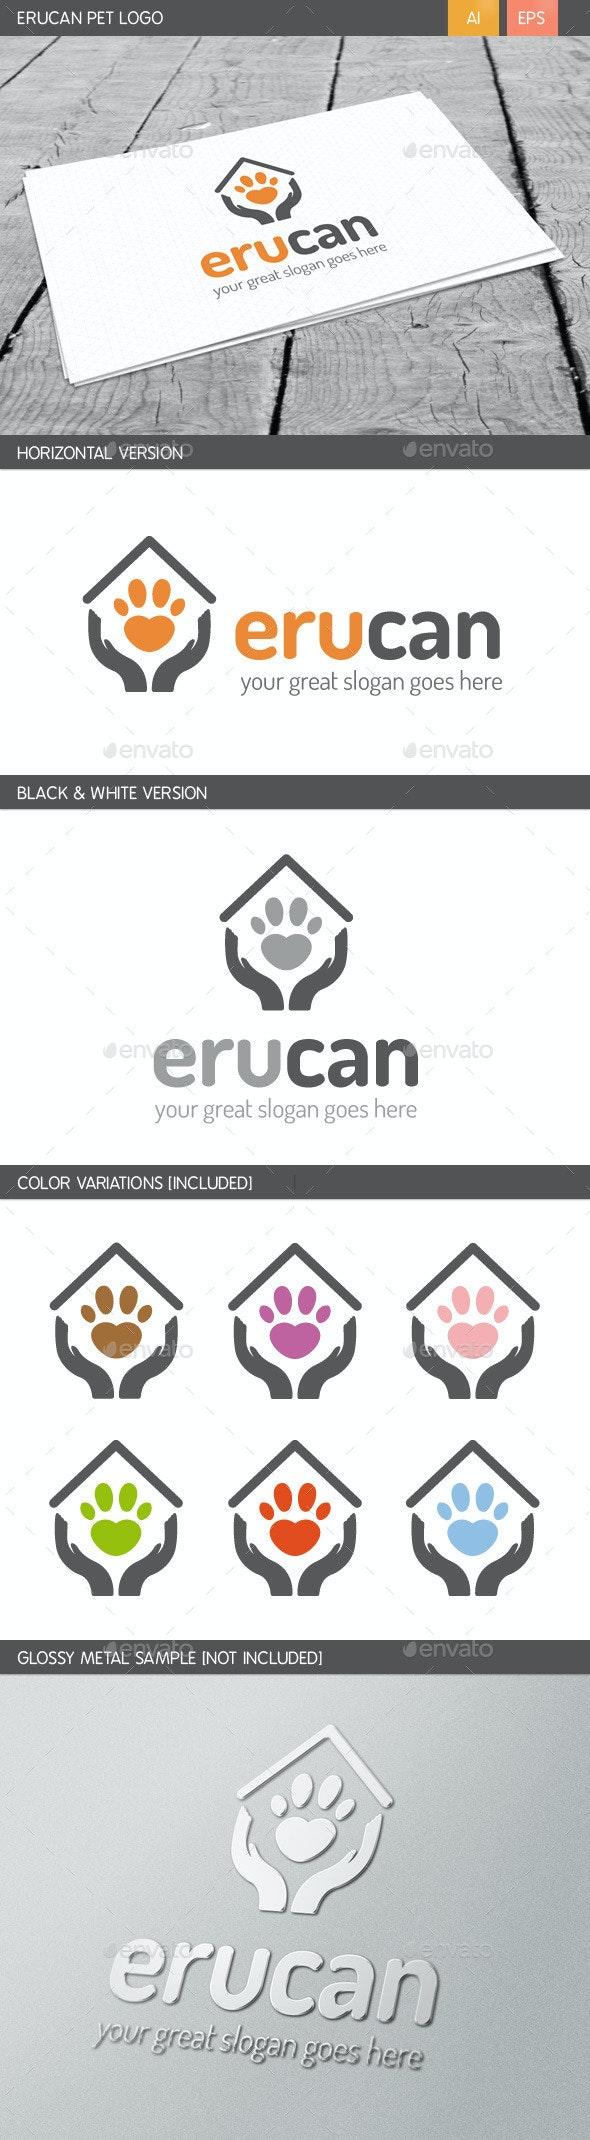 Erucan Pet Logo - Animals Logo Templates